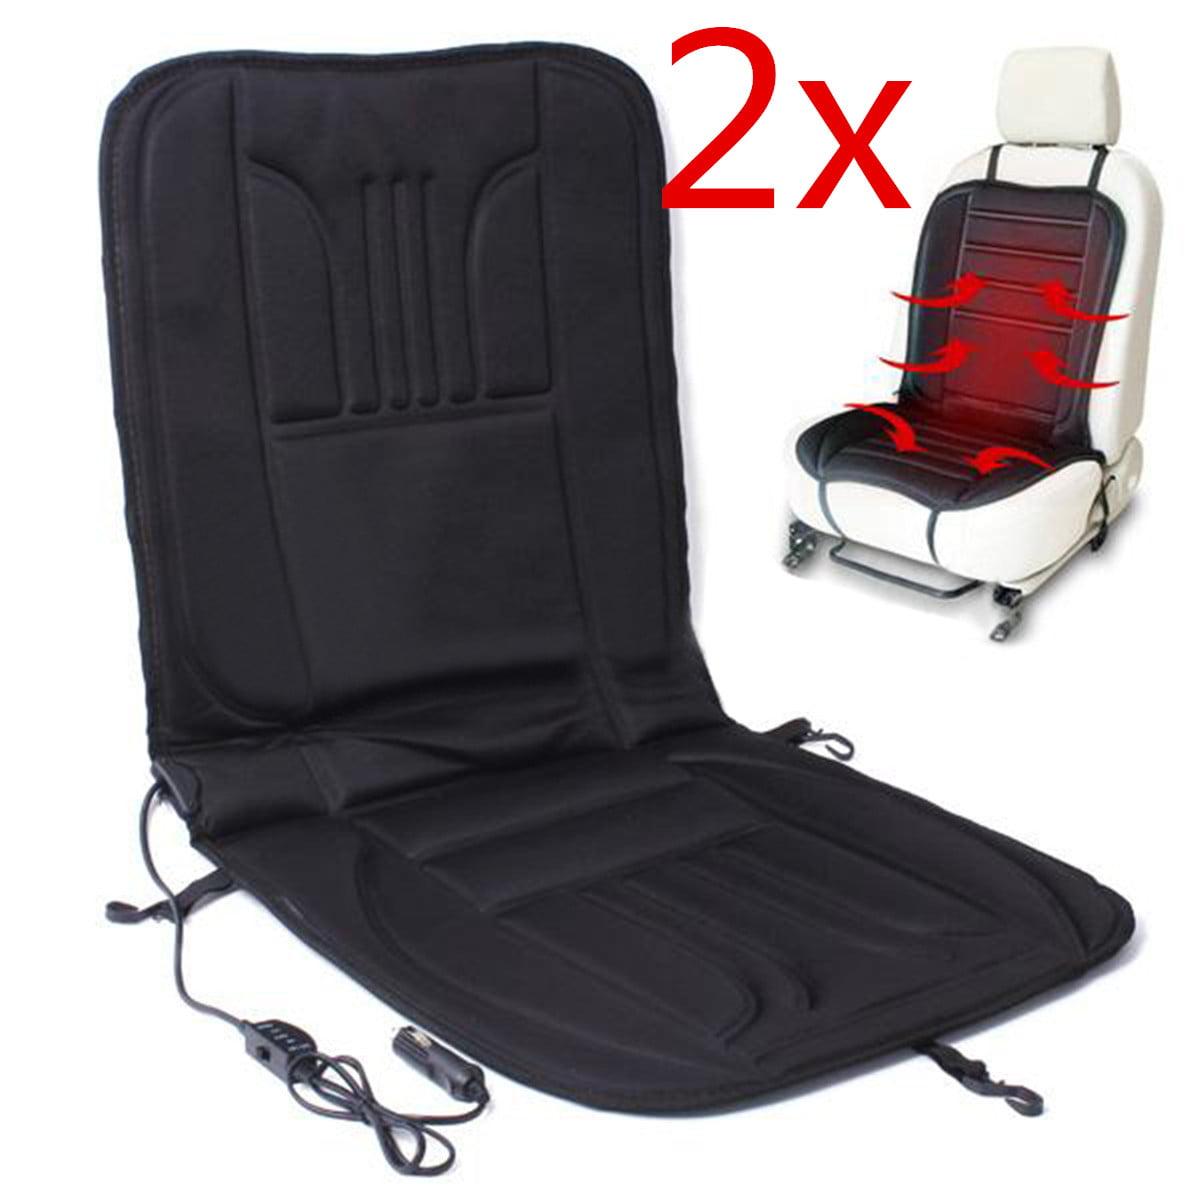 2Pcs Black Car Truck 2Pcs Vehicle Heated Pad Hot Front Seat Cushion Cover Warmer Winter